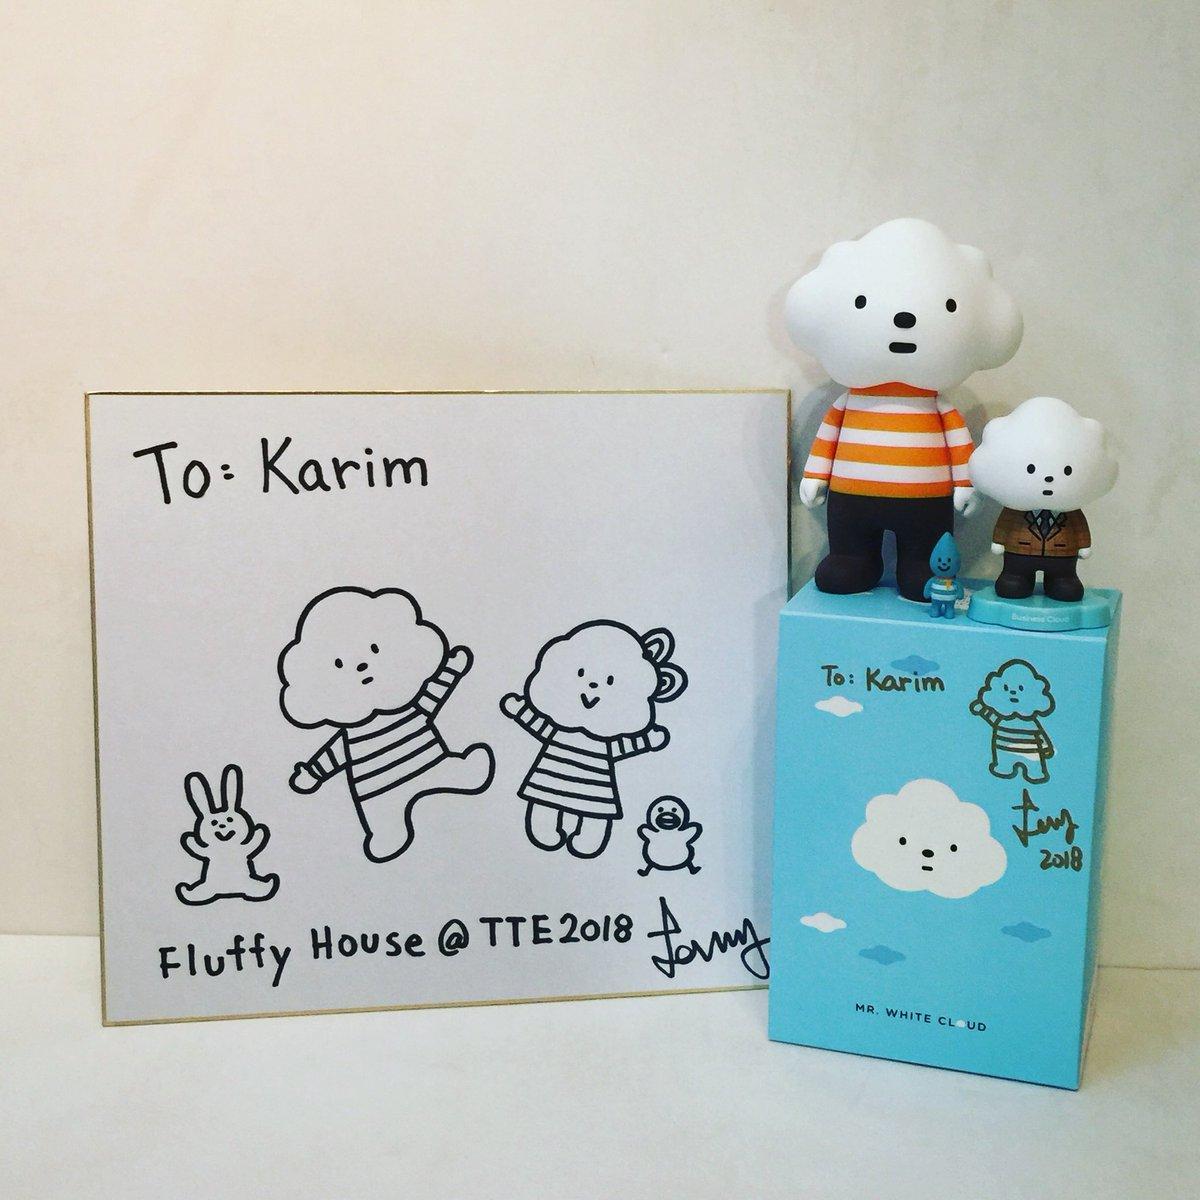 Thank you Lammy & Fluffy House☺️☁️☀️💧🐤🐰🐻  #fluffyhouse #fluffyhousehk #thankyoulammy #mrwhitecloud #littleraindrop #businesscloud #autograph #sketching #thailandtoyexpo #thailandtoyexpo2018 #tte #tte2018 #designertoy #softvinyltoy #arttoy @FluffyHouseCS https://t.co/1oWUIlzp3Q